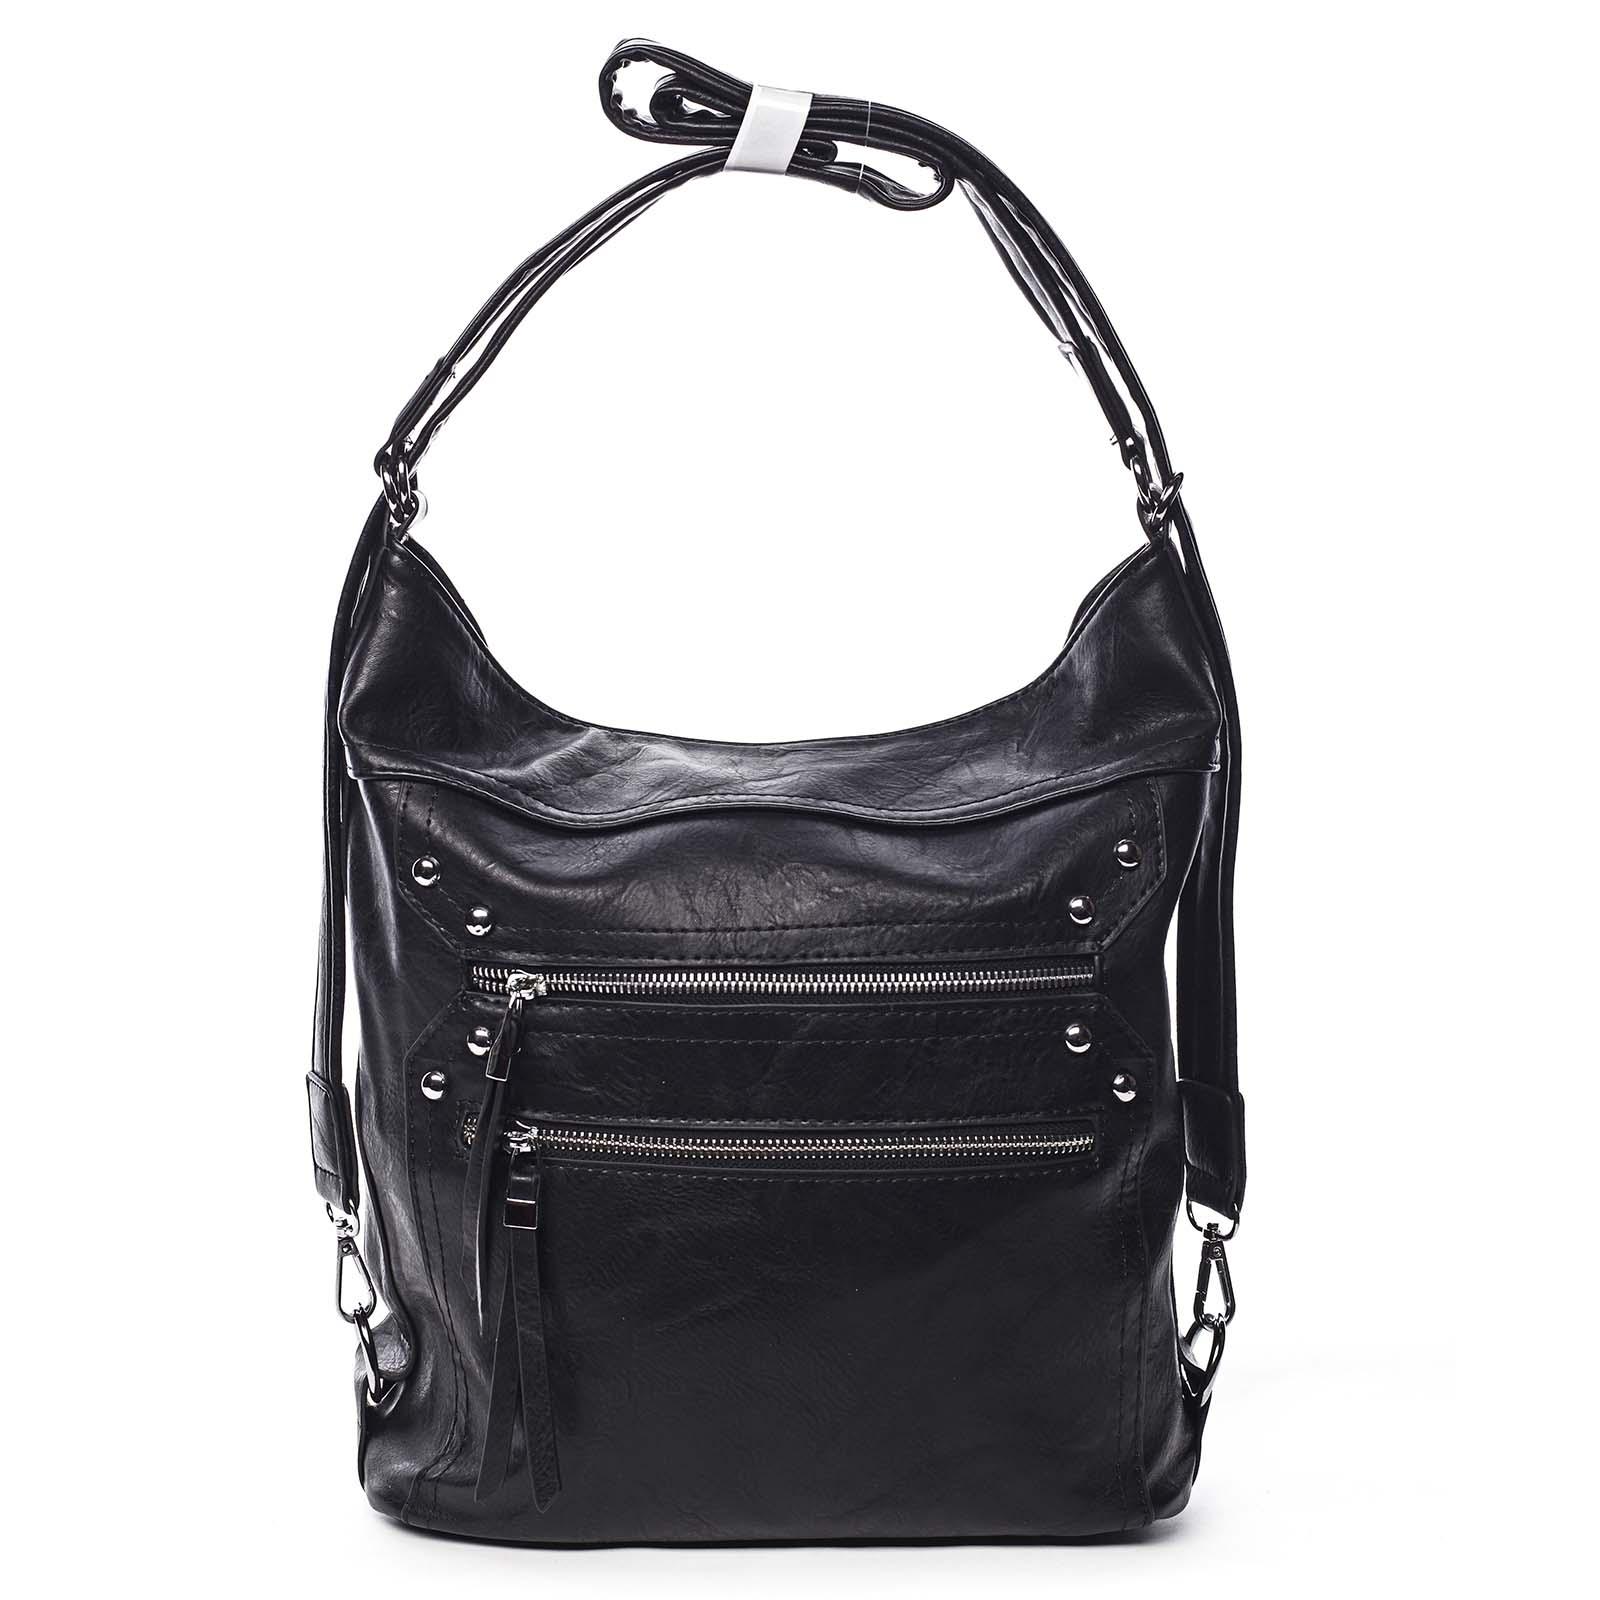 Dámská kabelka batoh černá - Romina Alfa